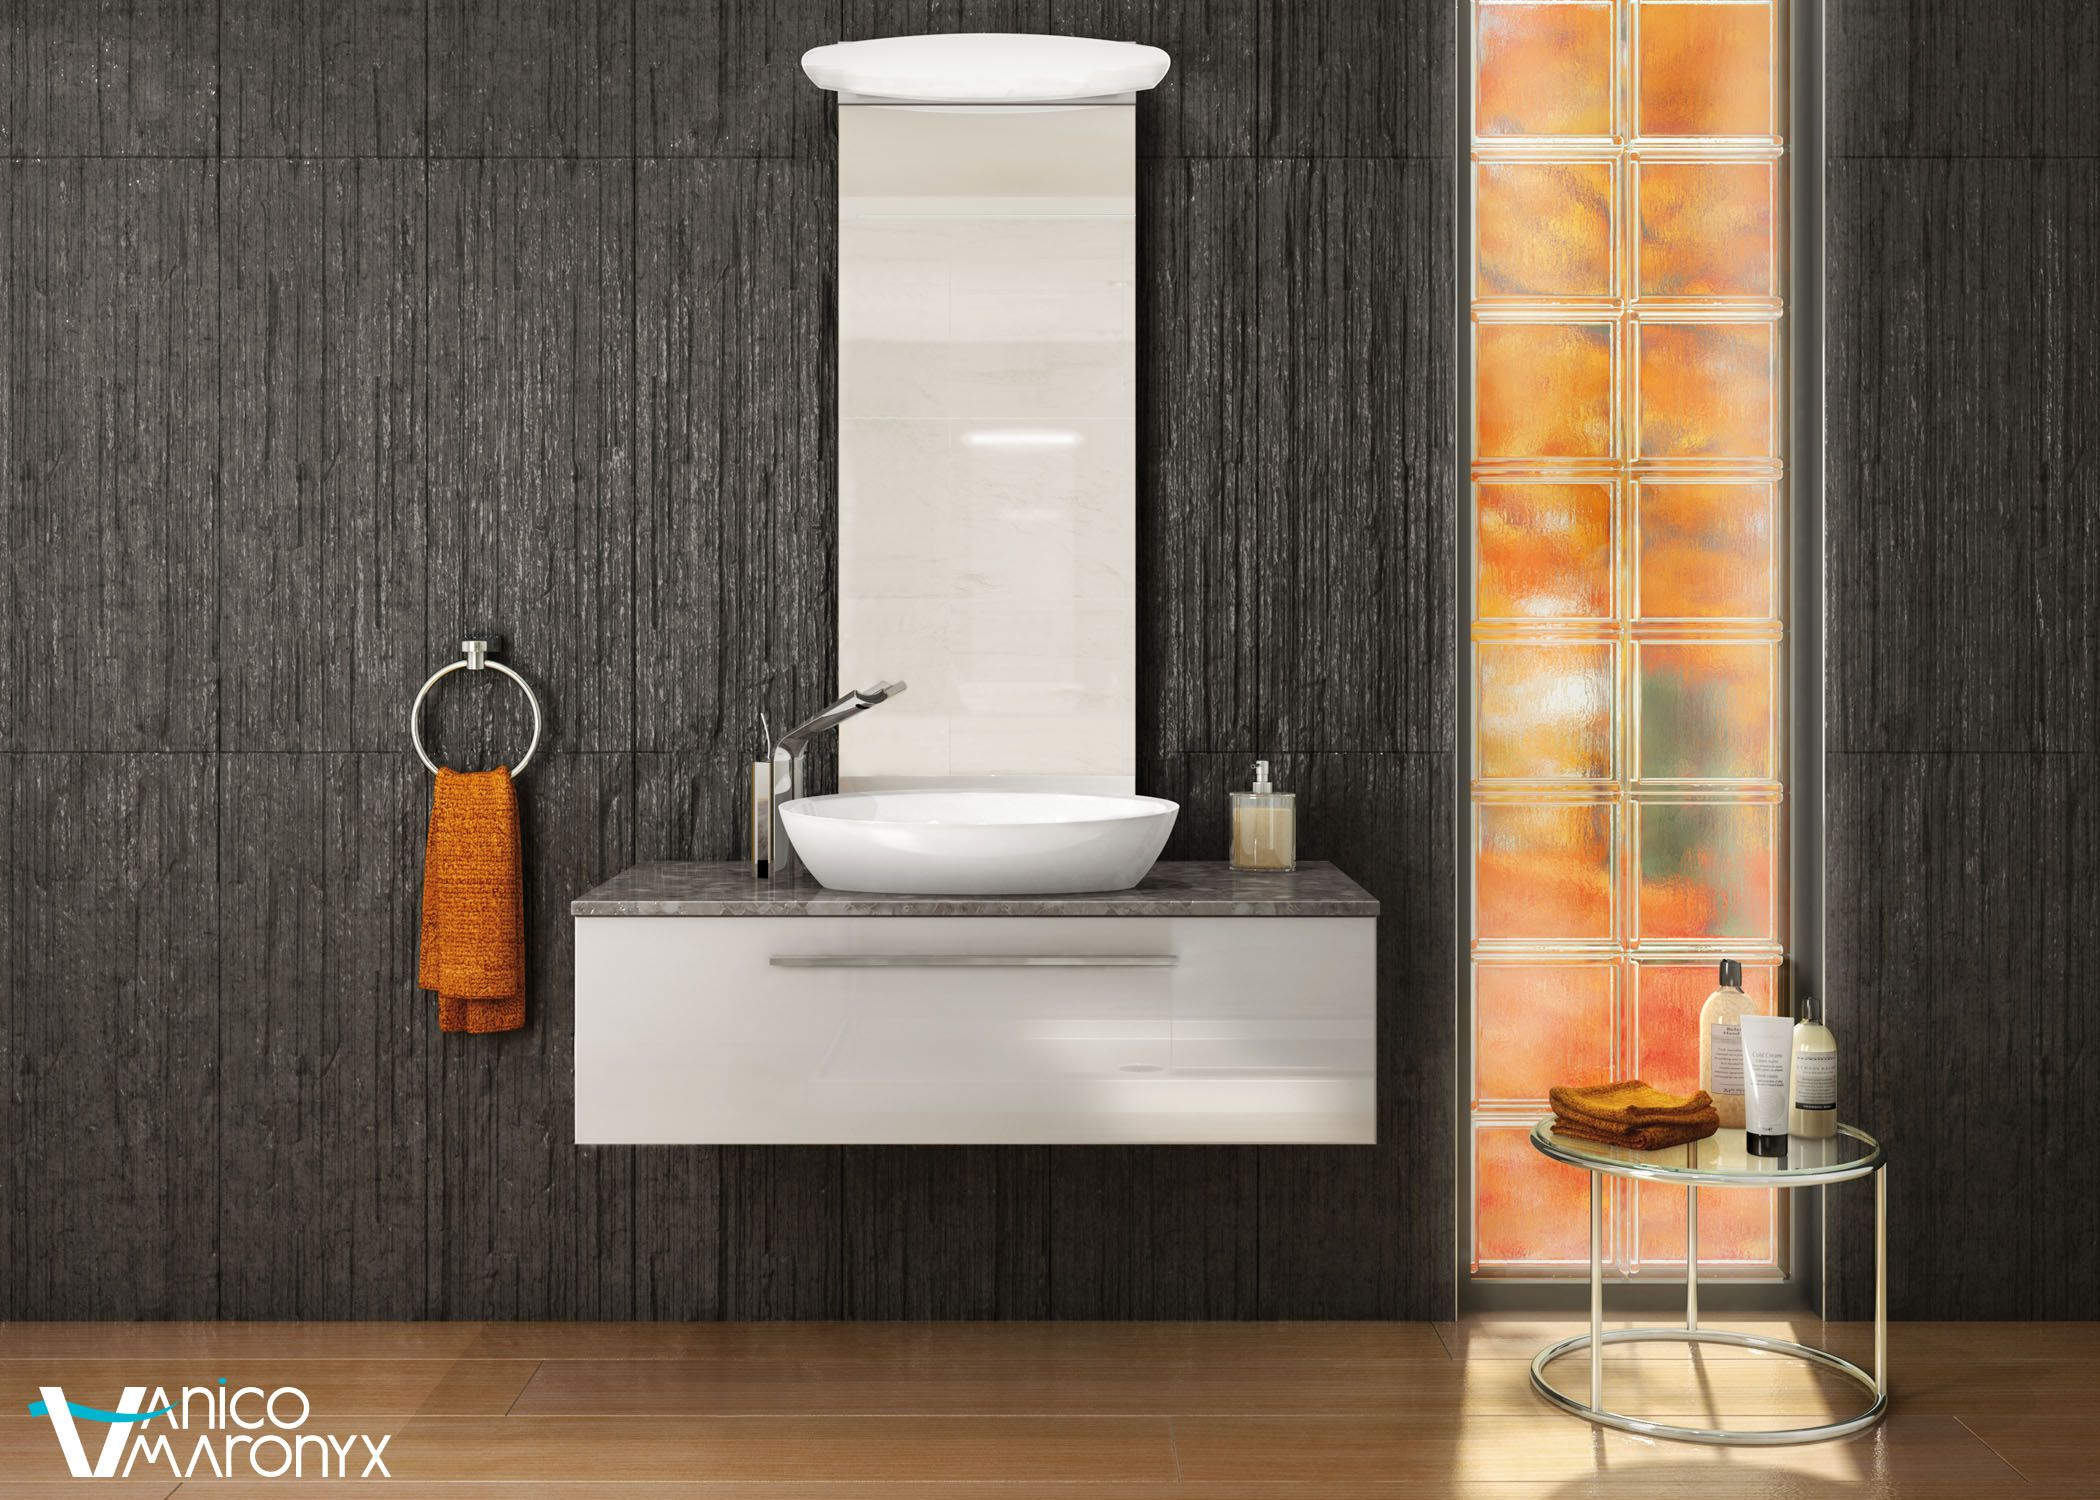 Sweet Home Salle De Bain ~ vanico maronyx s stylish bath vanity sweet home collection